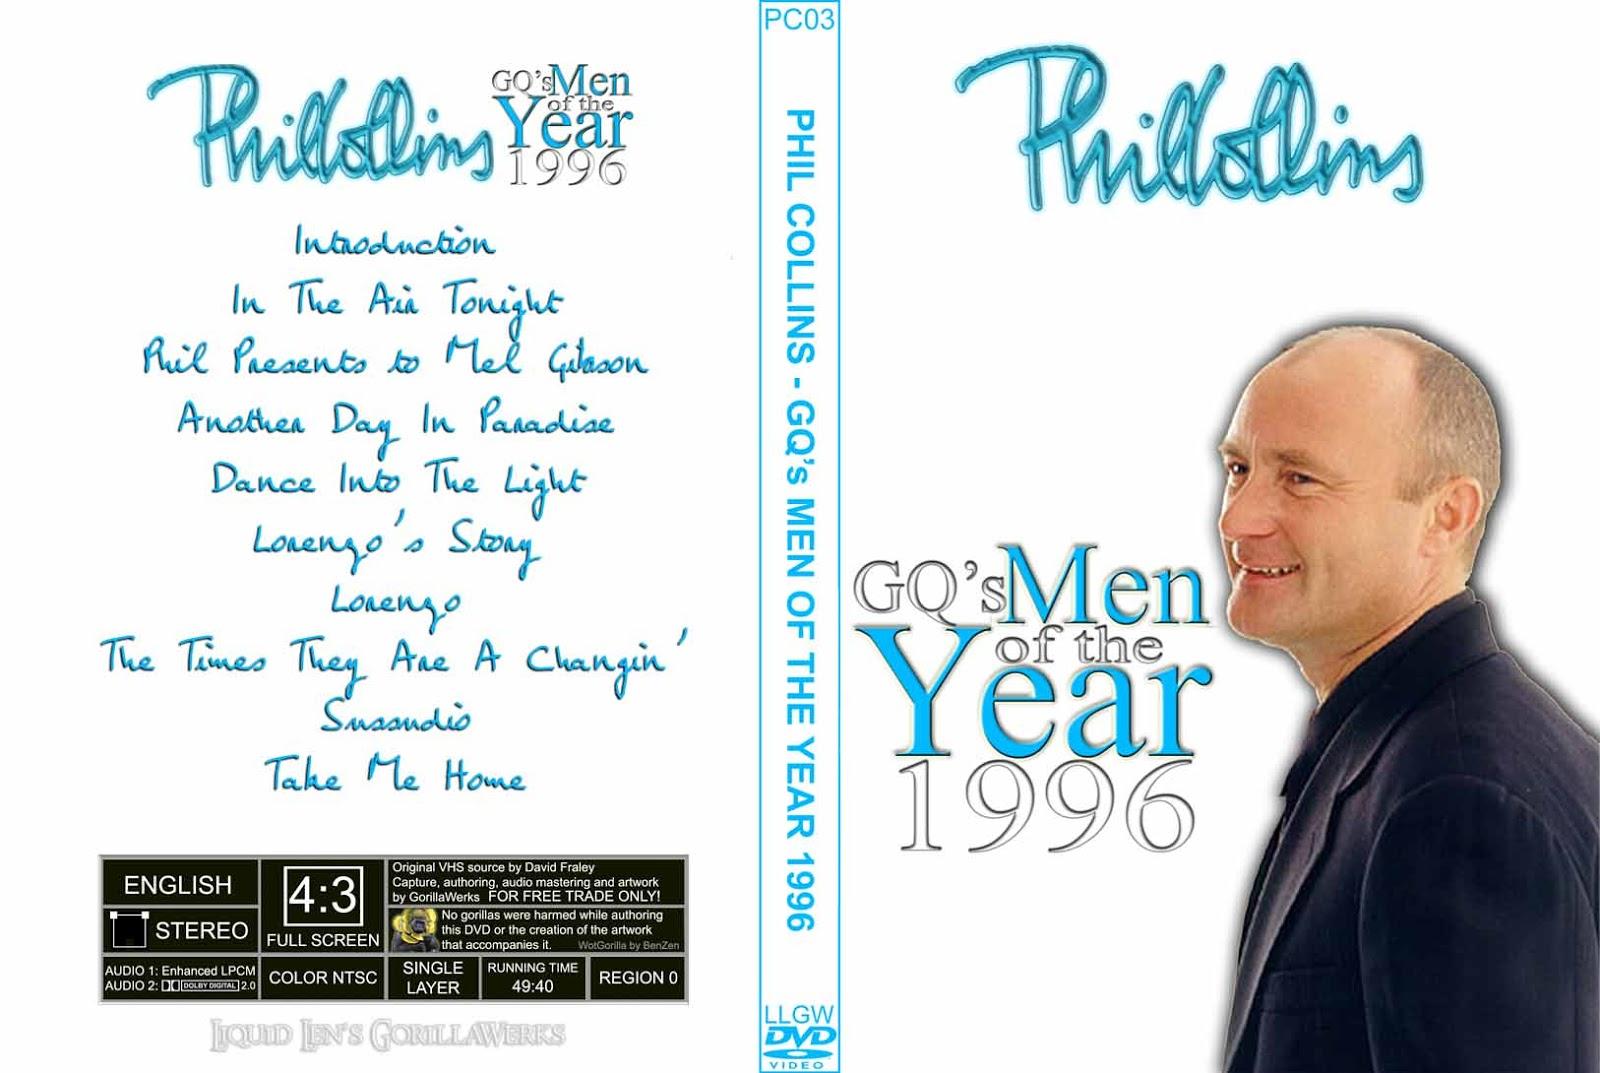 http://1.bp.blogspot.com/-Cd7zV0-U8nA/T7bfrucjwNI/AAAAAAAAF-8/kG30Yw9JeZ8/s1600/DVD+Cover+-+Phil+Collins+-+GQ%27s+Men+Of+The+Year+1996.jpg